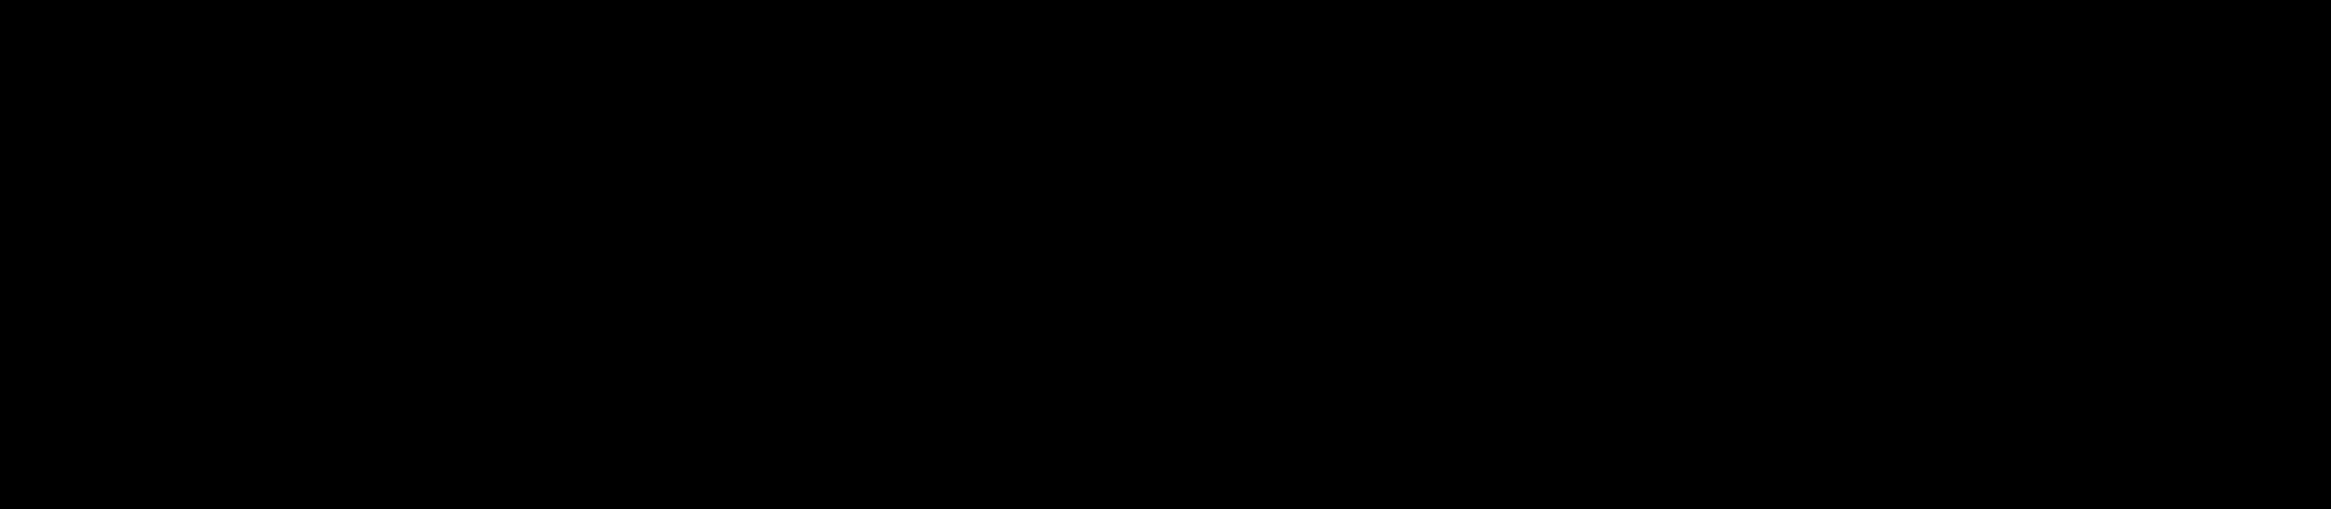 Oakley Logo Font « Heritage Malta.